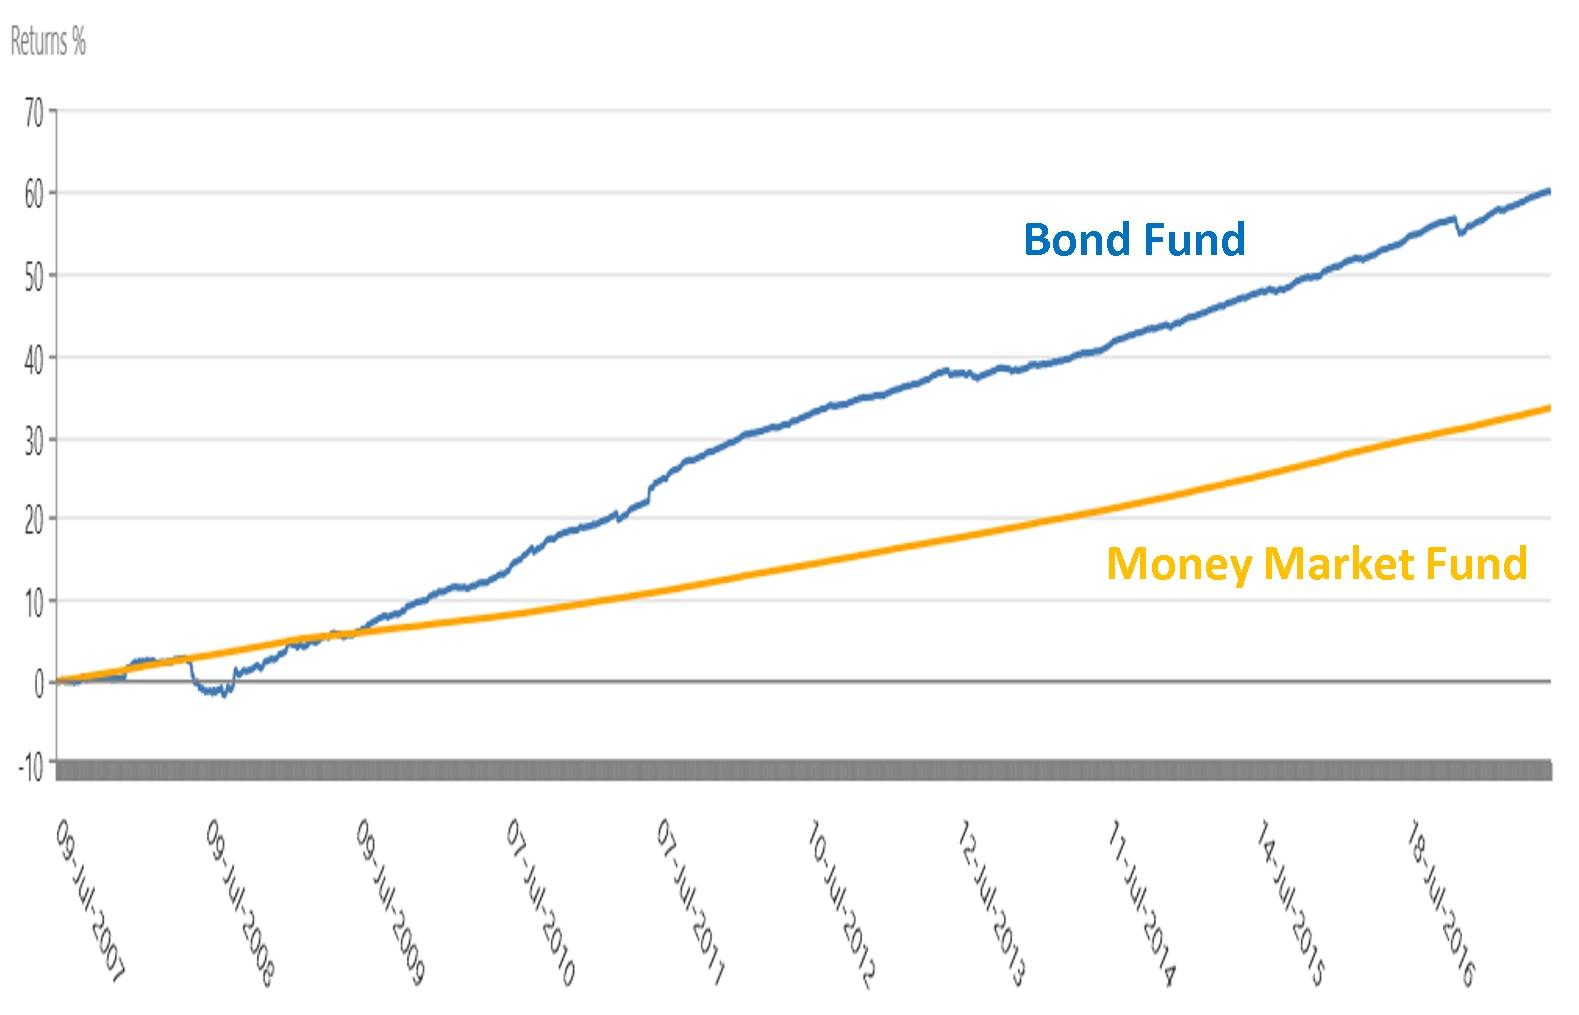 High Level Rules: 48) Money Market Fund vs Bond Fund